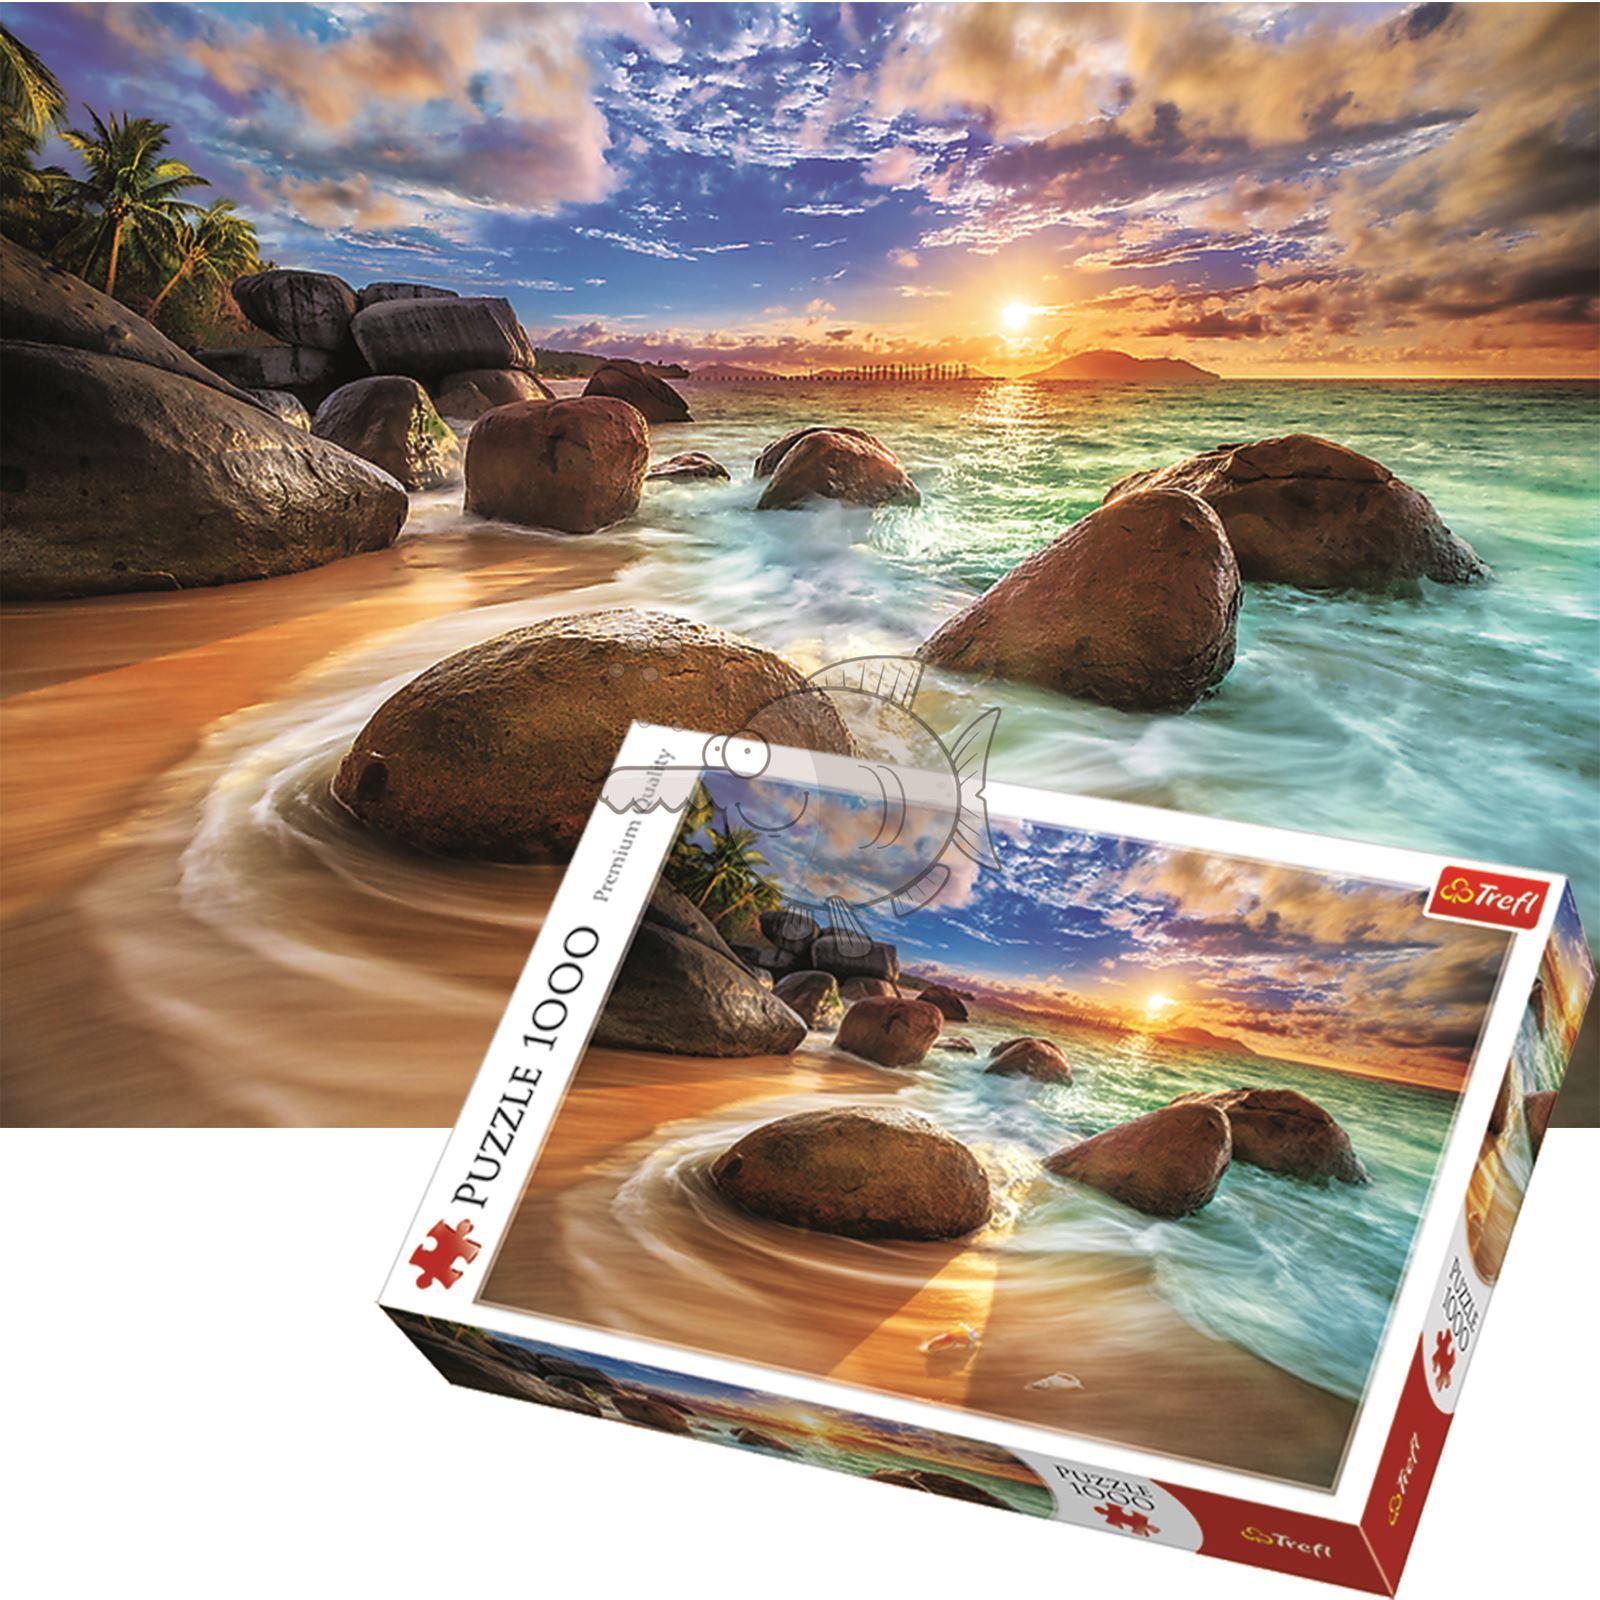 Trefl-300-500-1000-1500-2000-3000-4000-6000-Piece-Jigsaw-Puzzle-Landscapes-City thumbnail 306